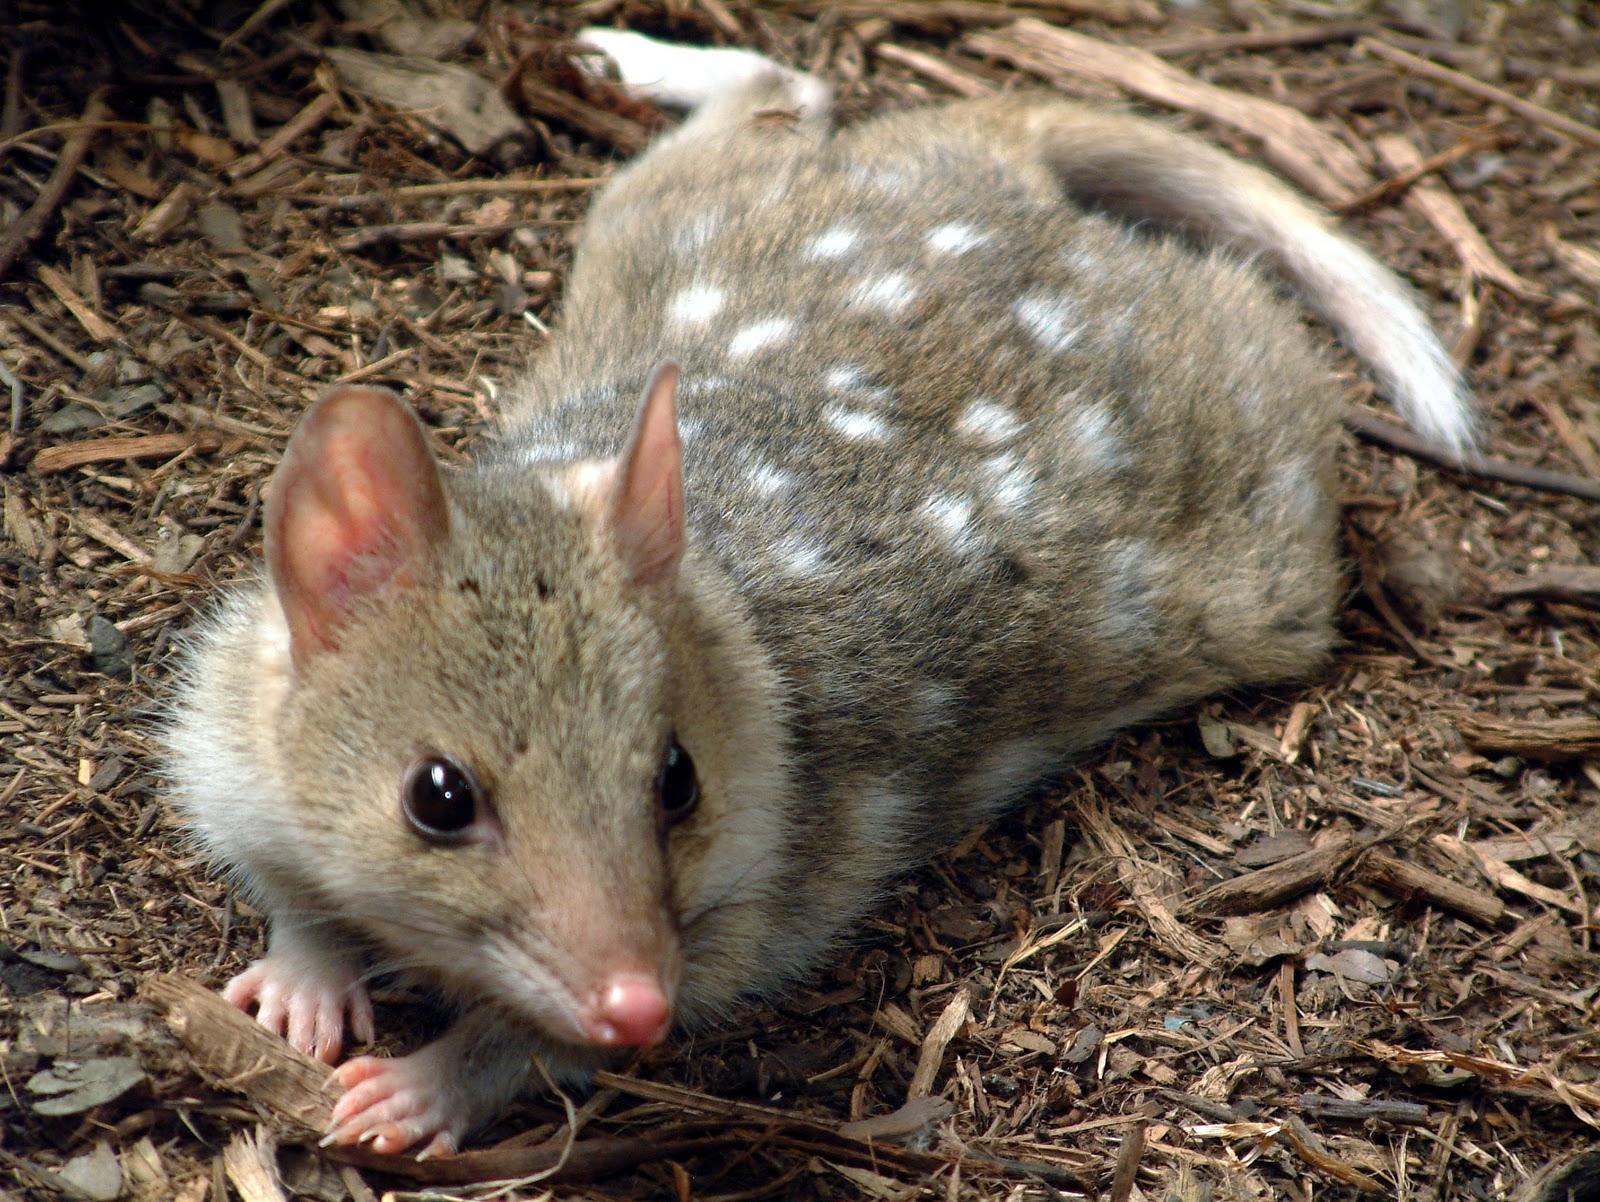 Quoll | The Life of AnimalsKangaroo Rat Eating